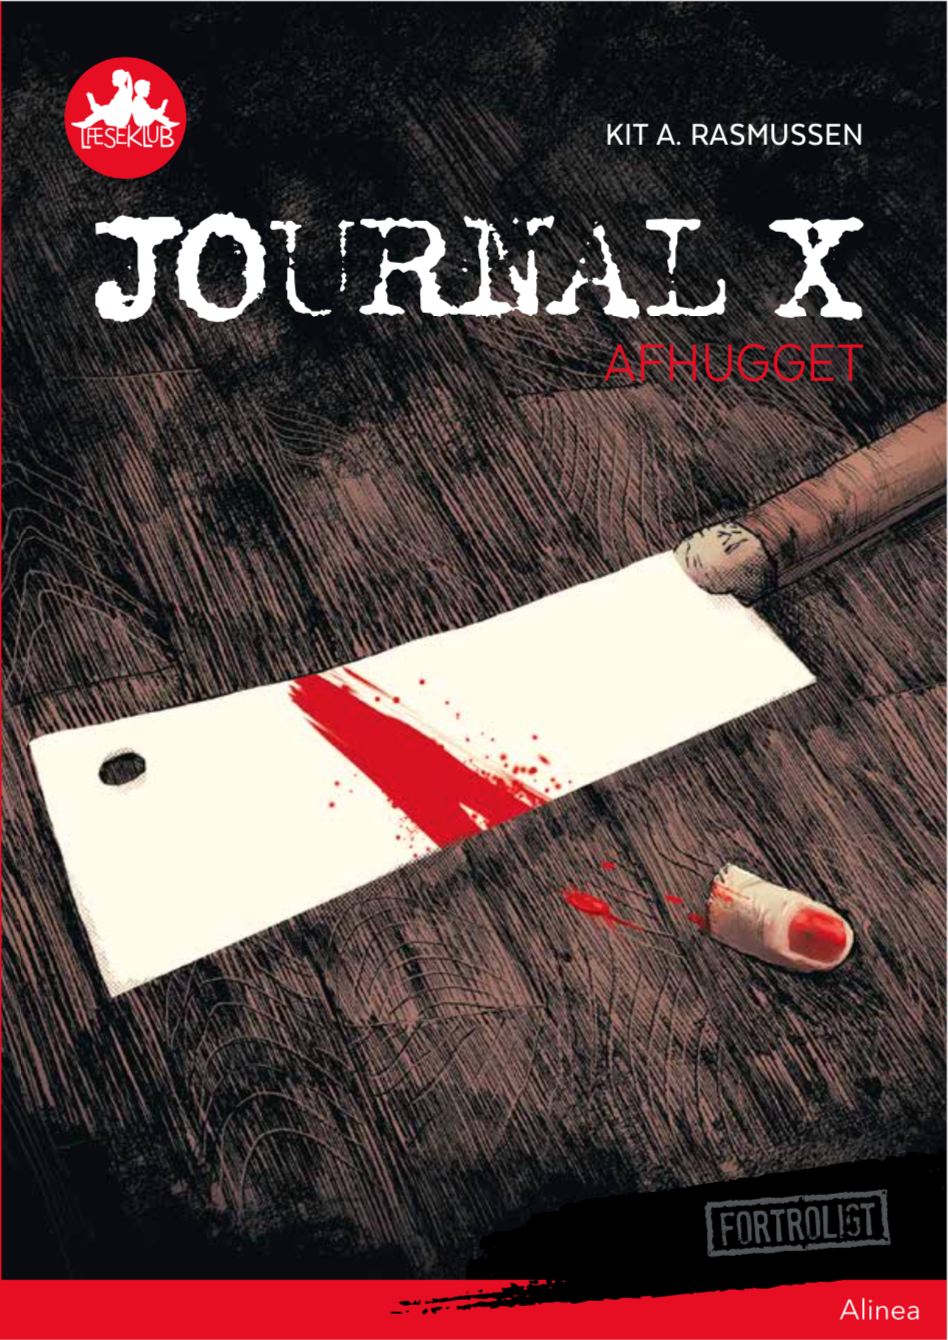 Journal X: Afhugget